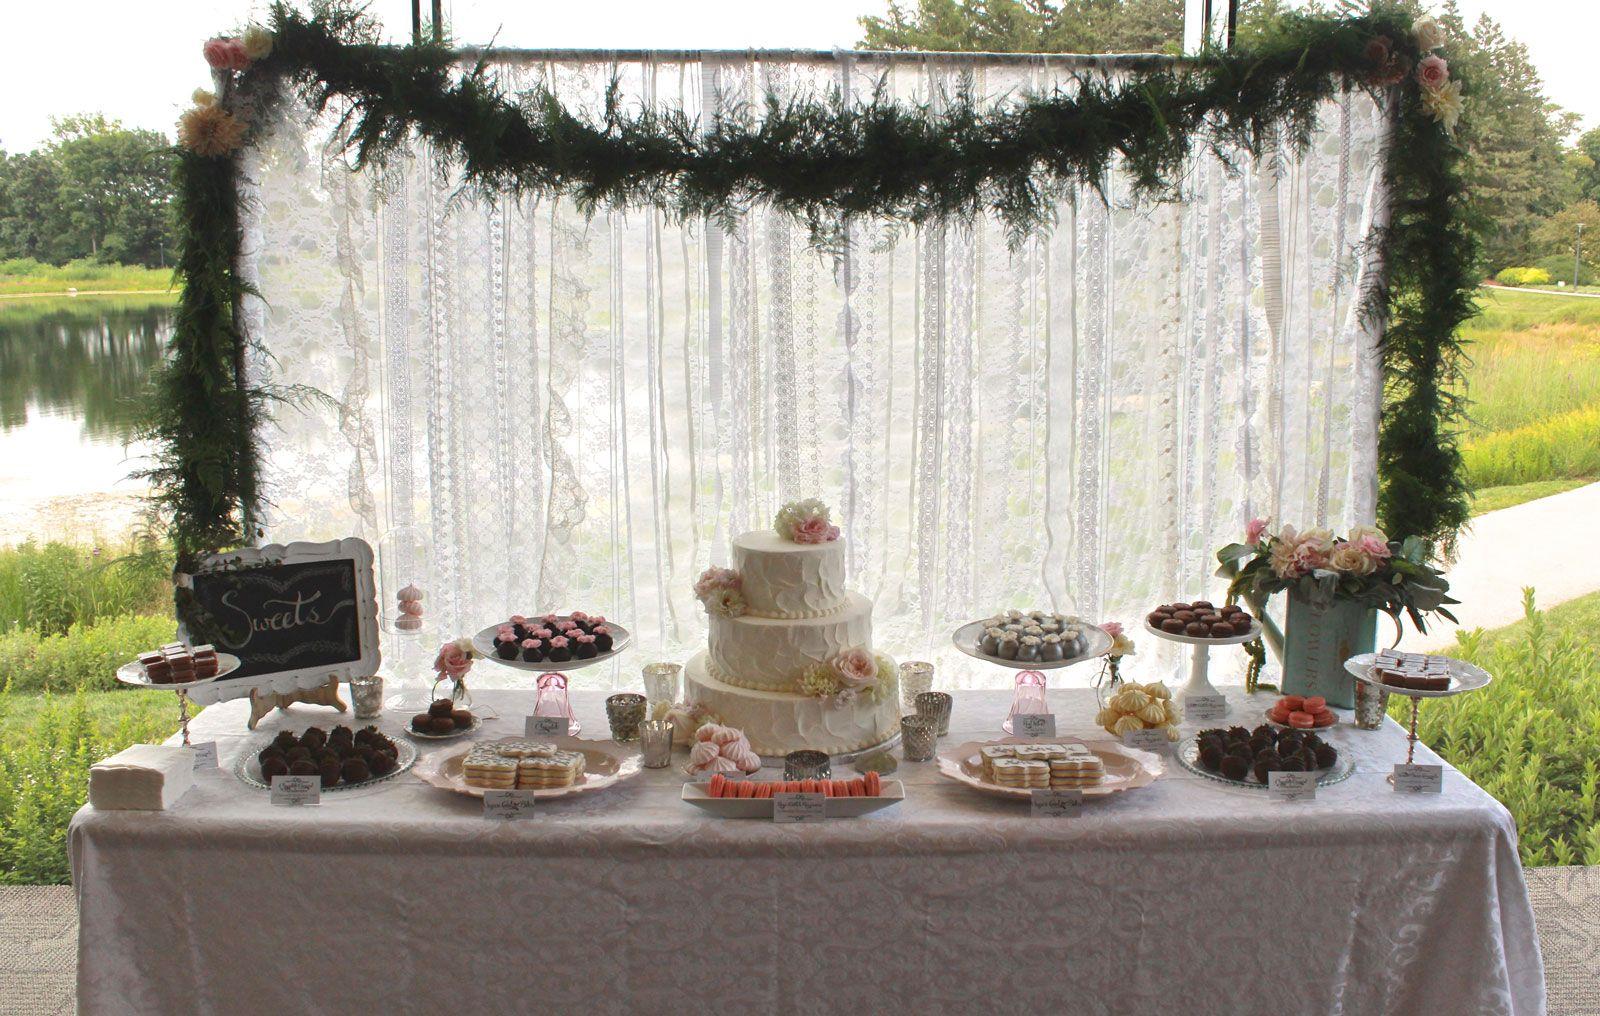 morton arboretum wedding photos - Google Search | Wedding - Decor ...